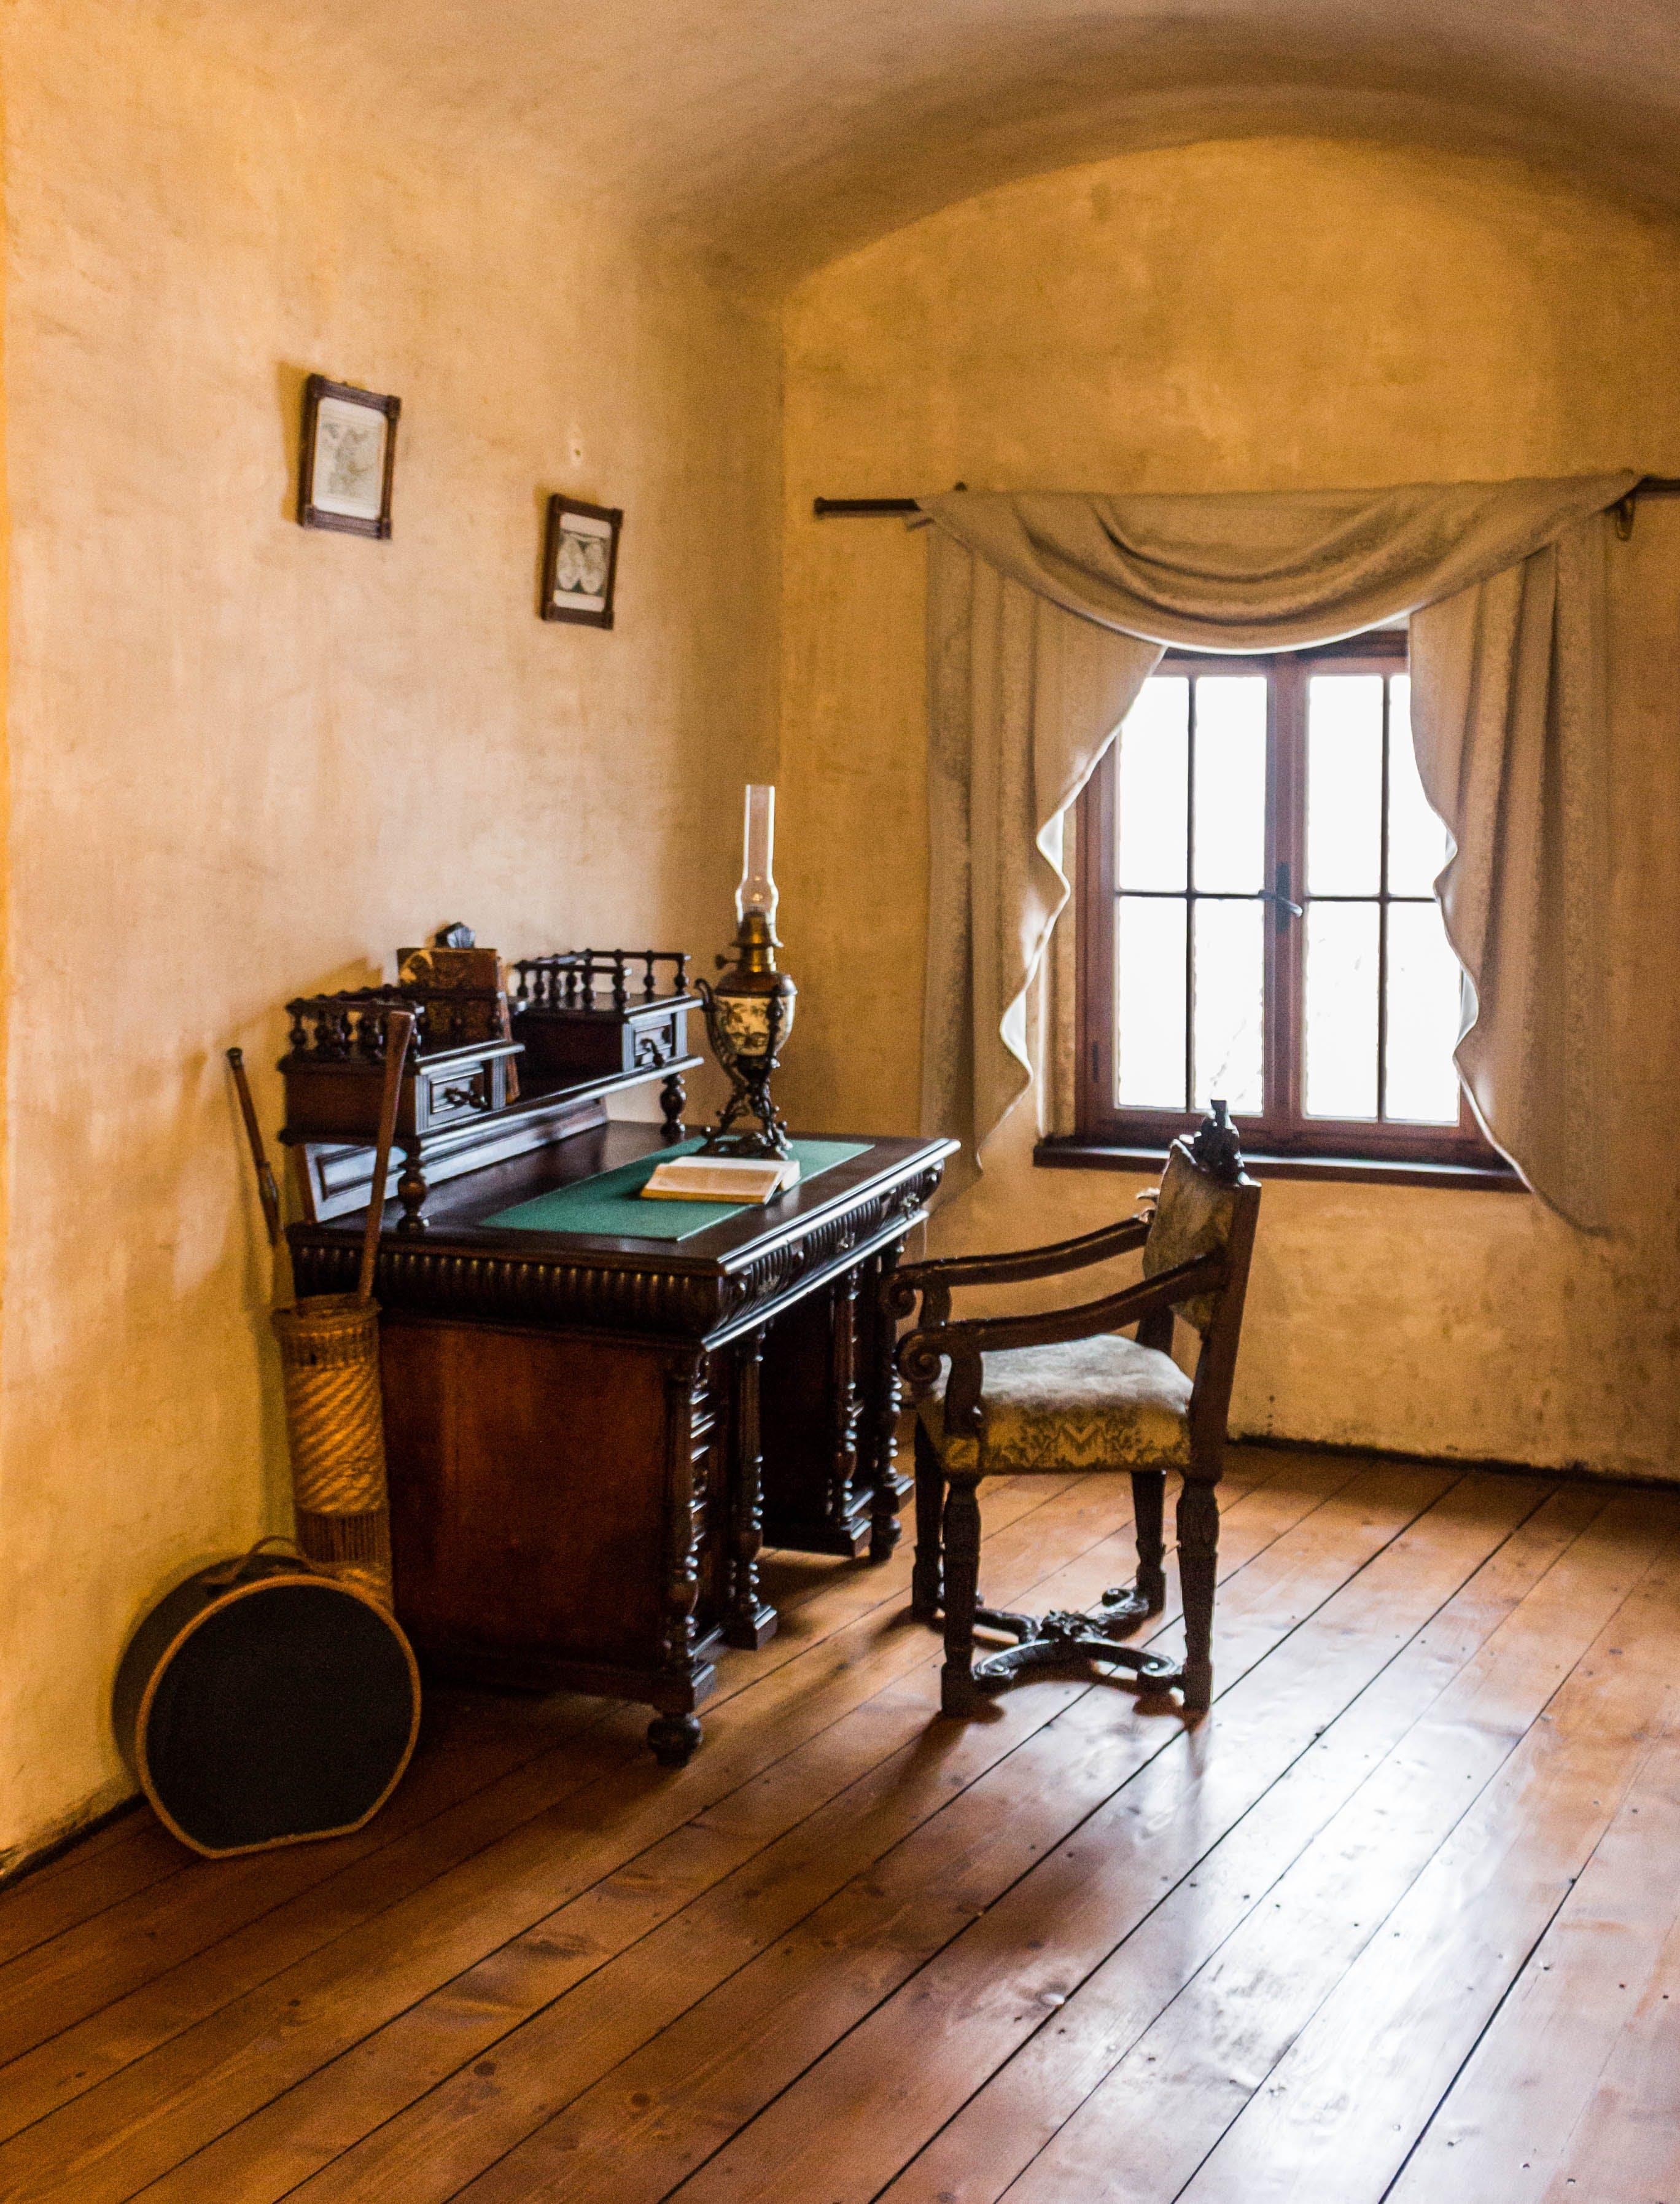 Free stock photo of european, history, indoors, interior